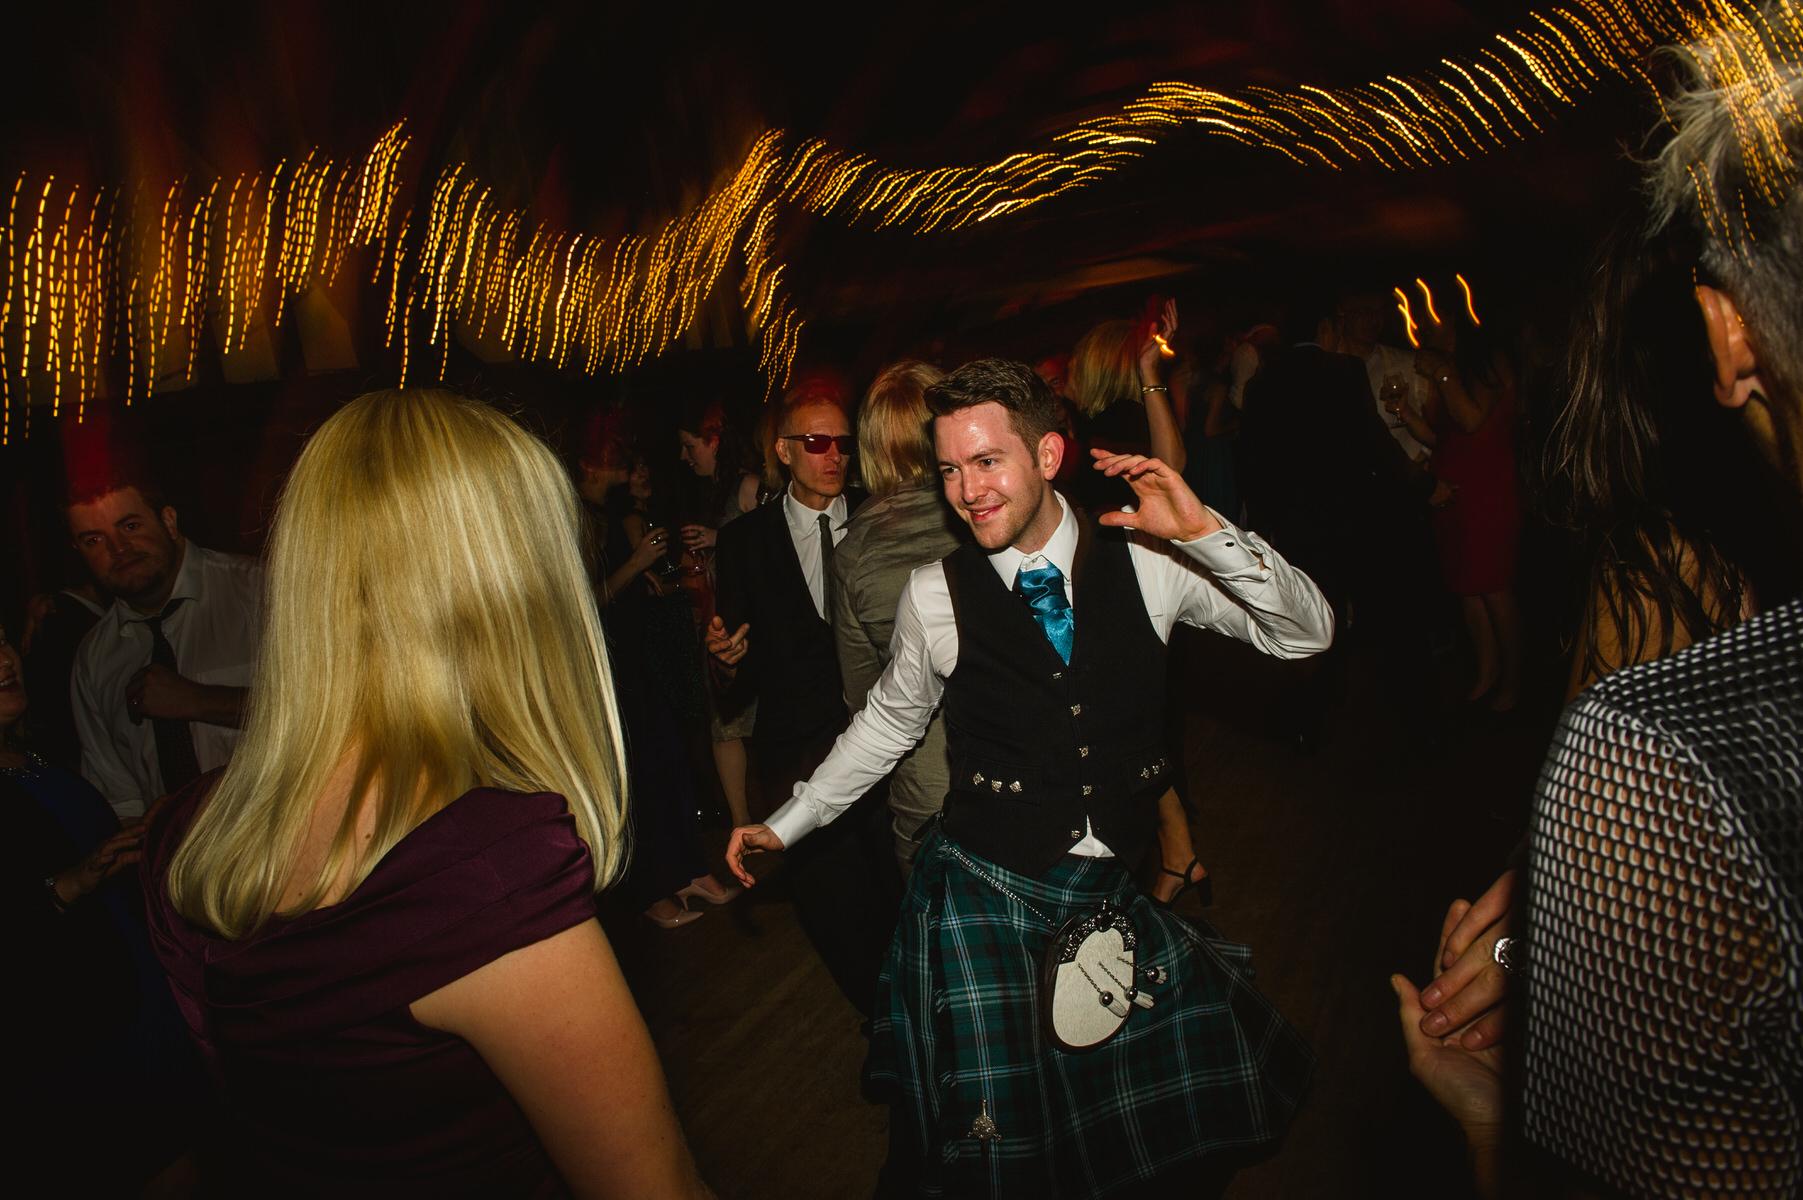 ceiledh at weddings